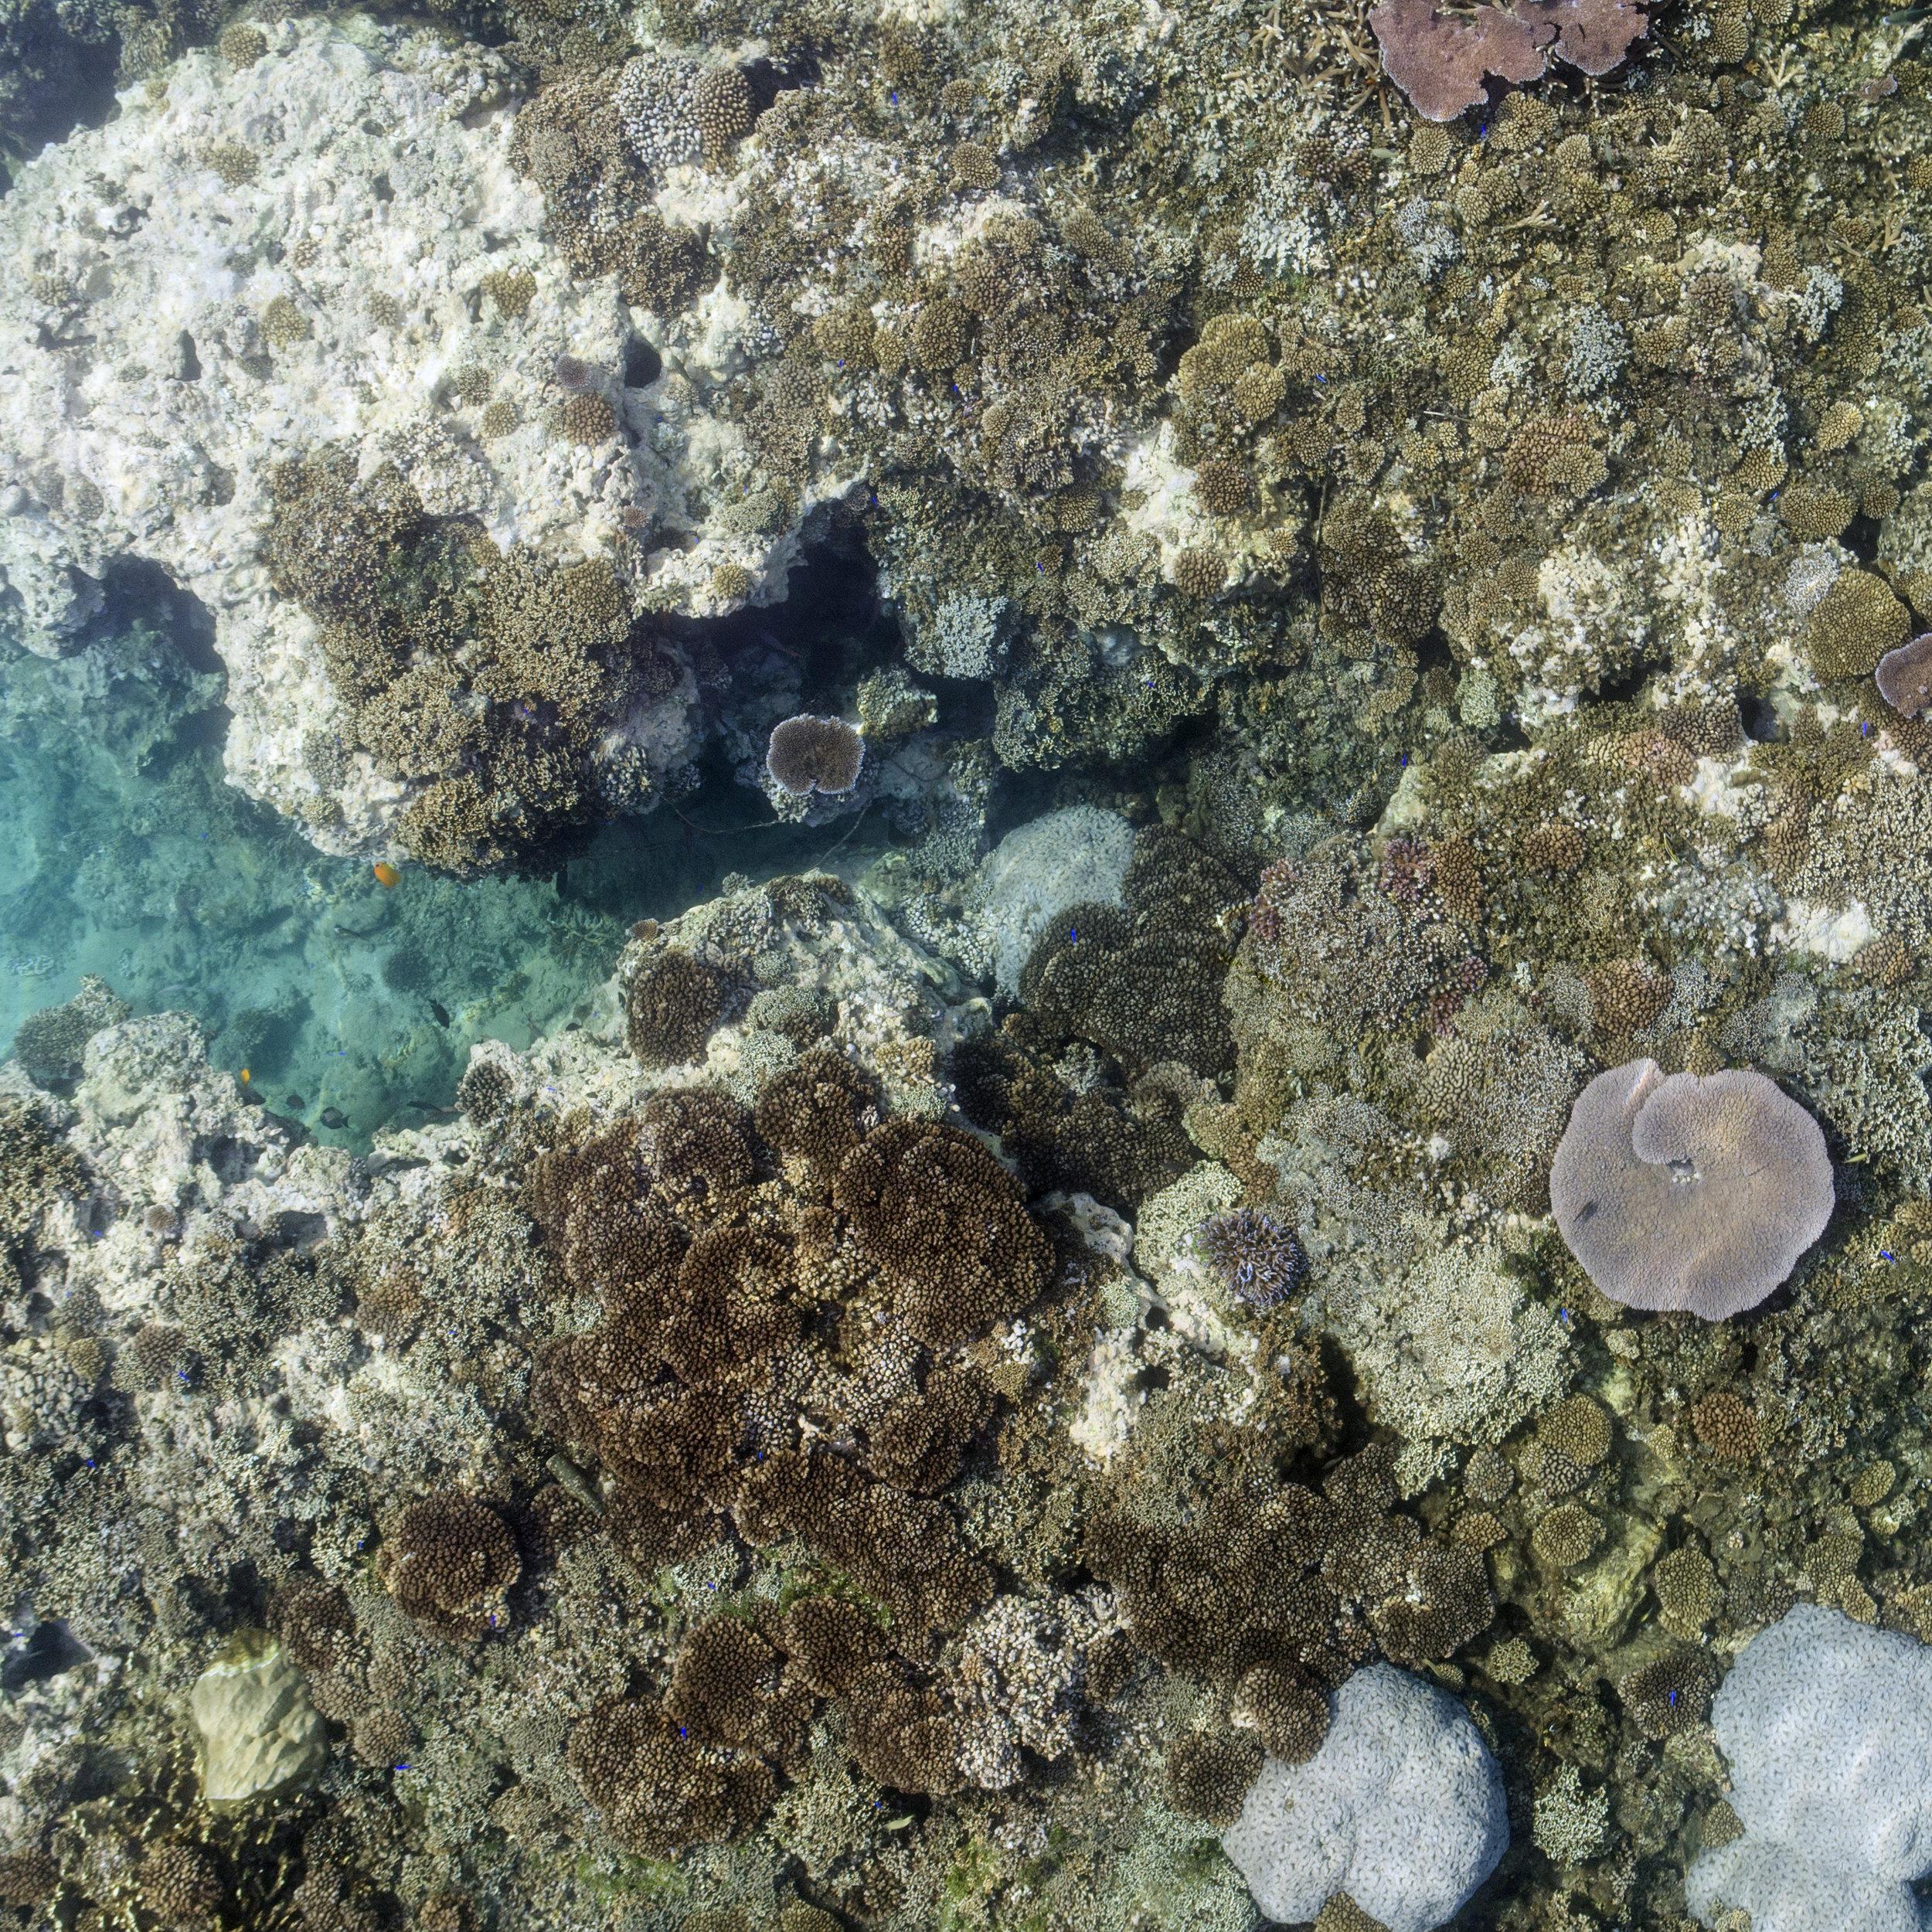 alegra bay, american samoa credit: diane burko / coral reef image bank